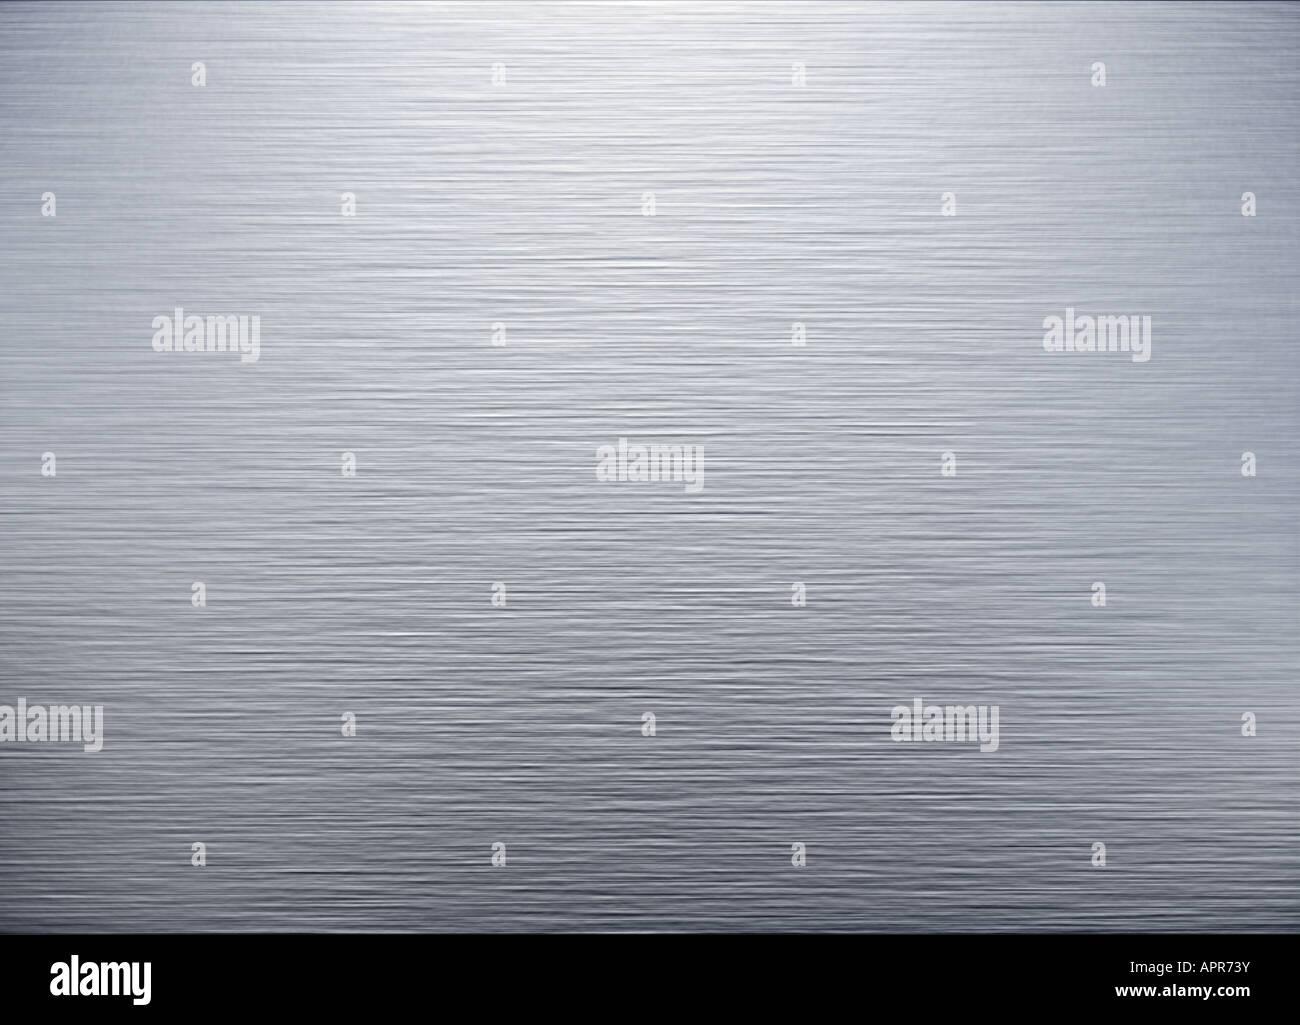 very large sheet of brushed steel metal Stock Photo